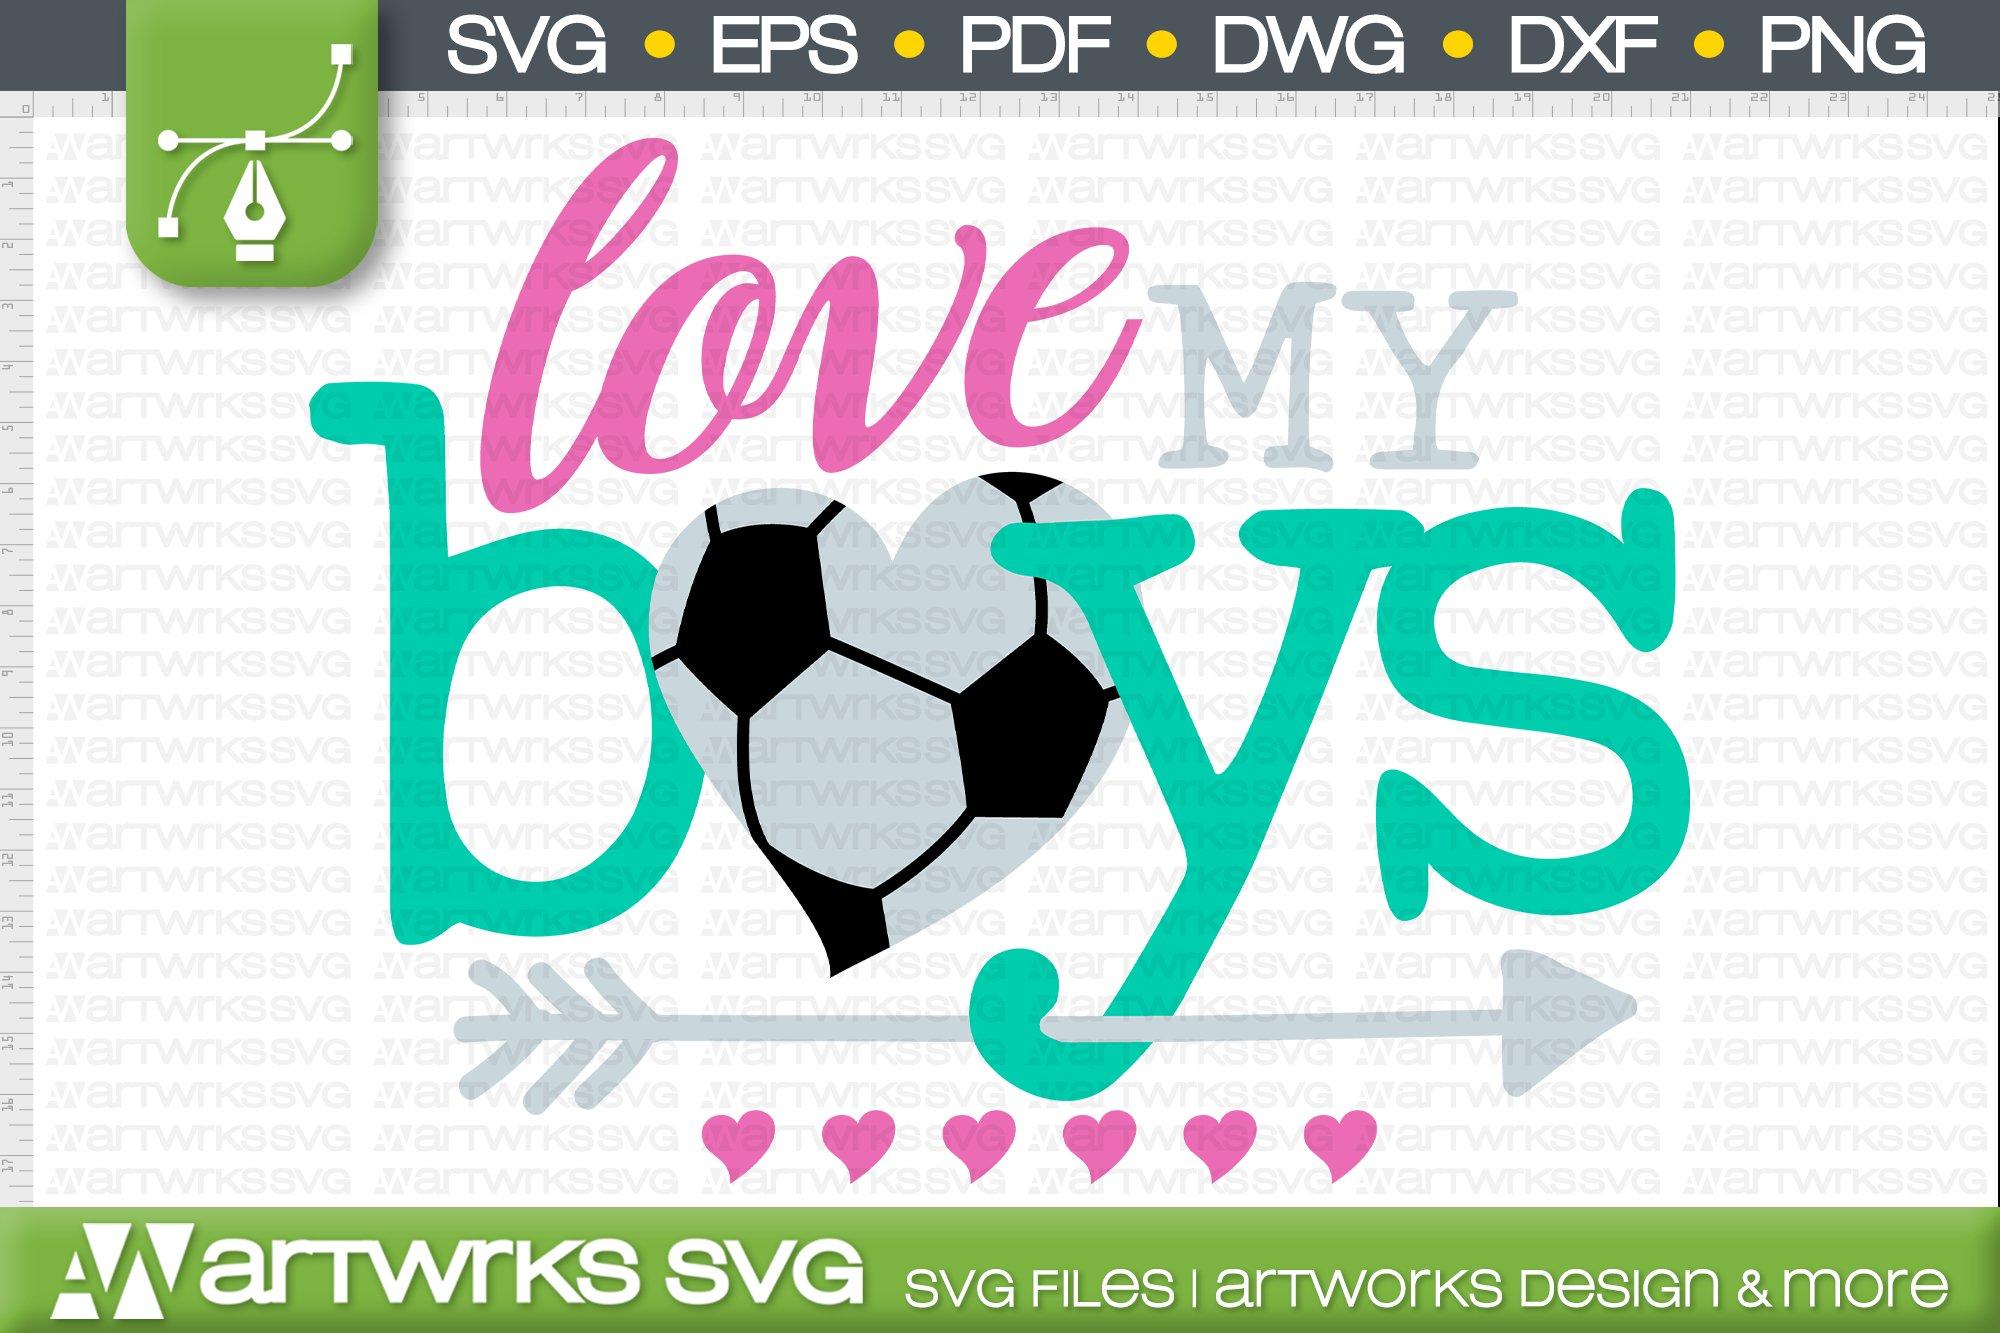 Soccer Mom Svg Files For Cricut Love My Boys 542519 Cut Files Design Bundles